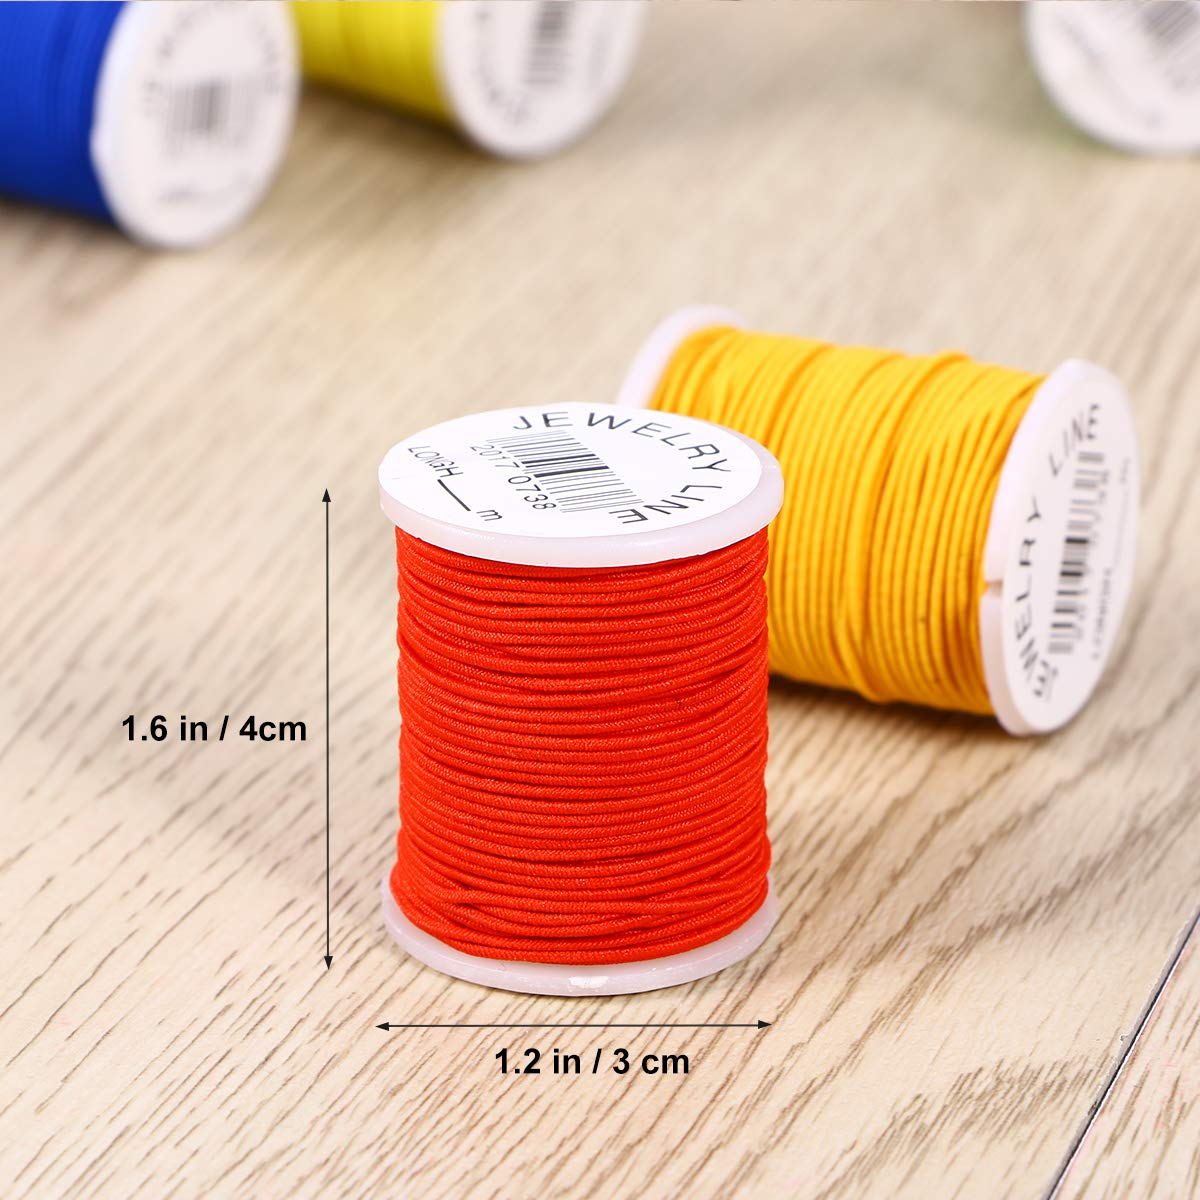 Random Color Supvox 10PCS Nylon Sewing Thread Jewelry Making Craft Beading Elastic Thread Cord Spools